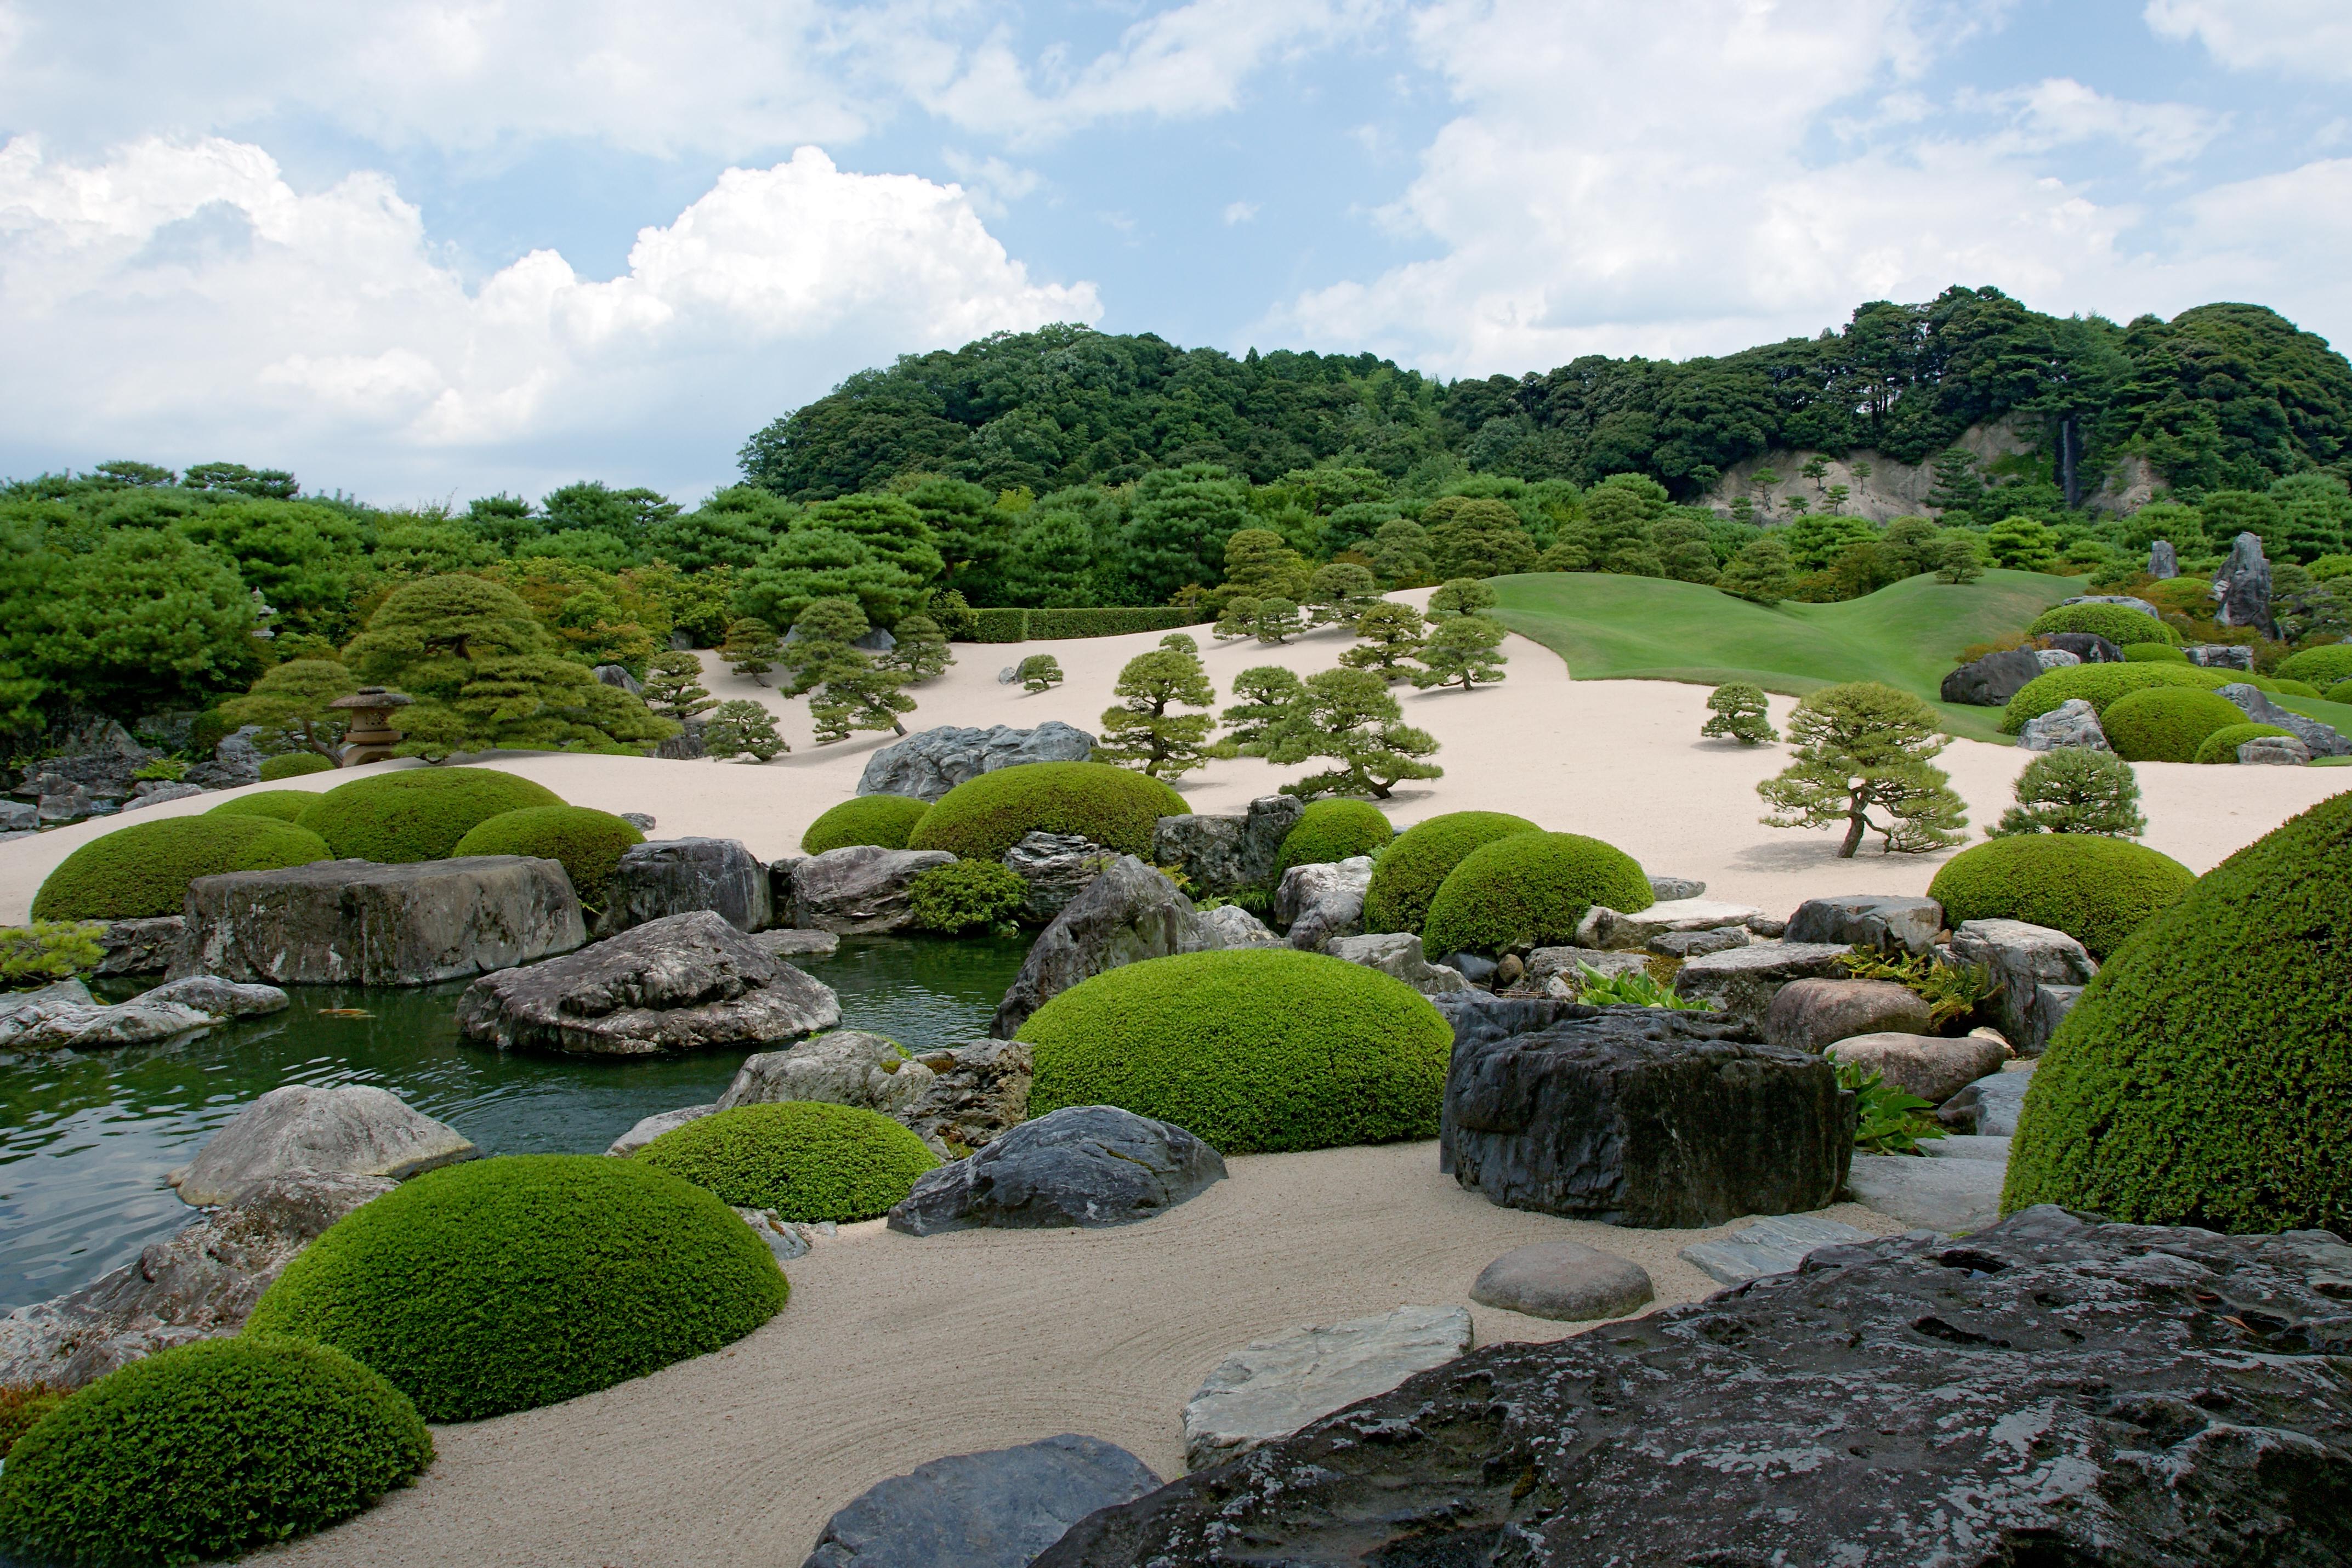 Adachi Museum Of Art In Shimane|taiken Japan